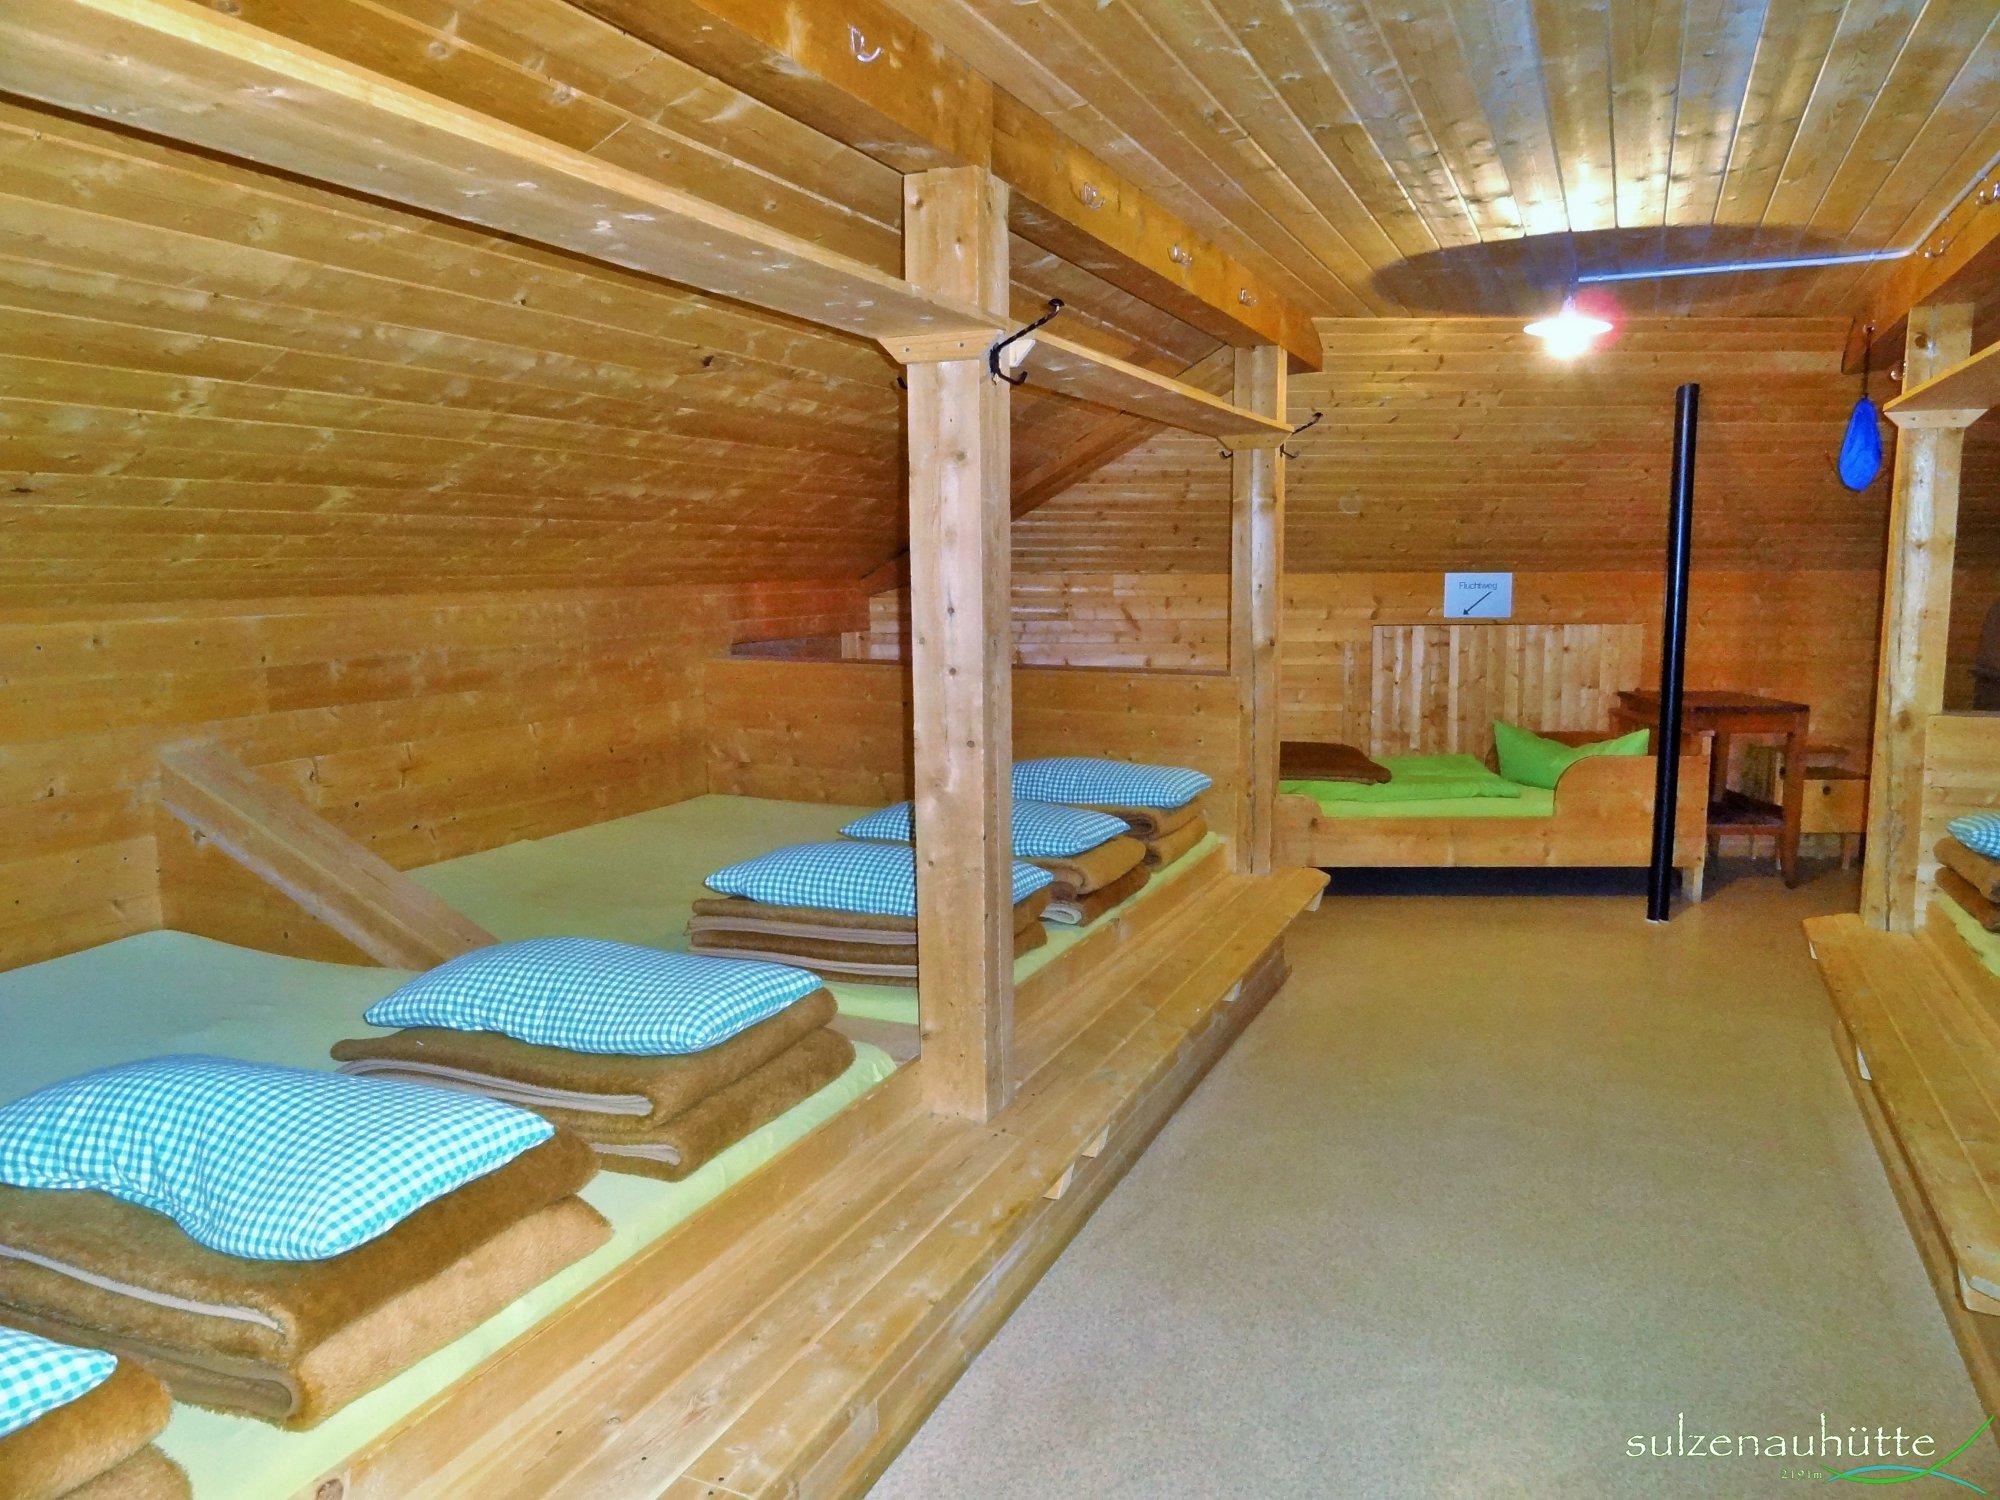 Larger dormitories of Sulzenau hut